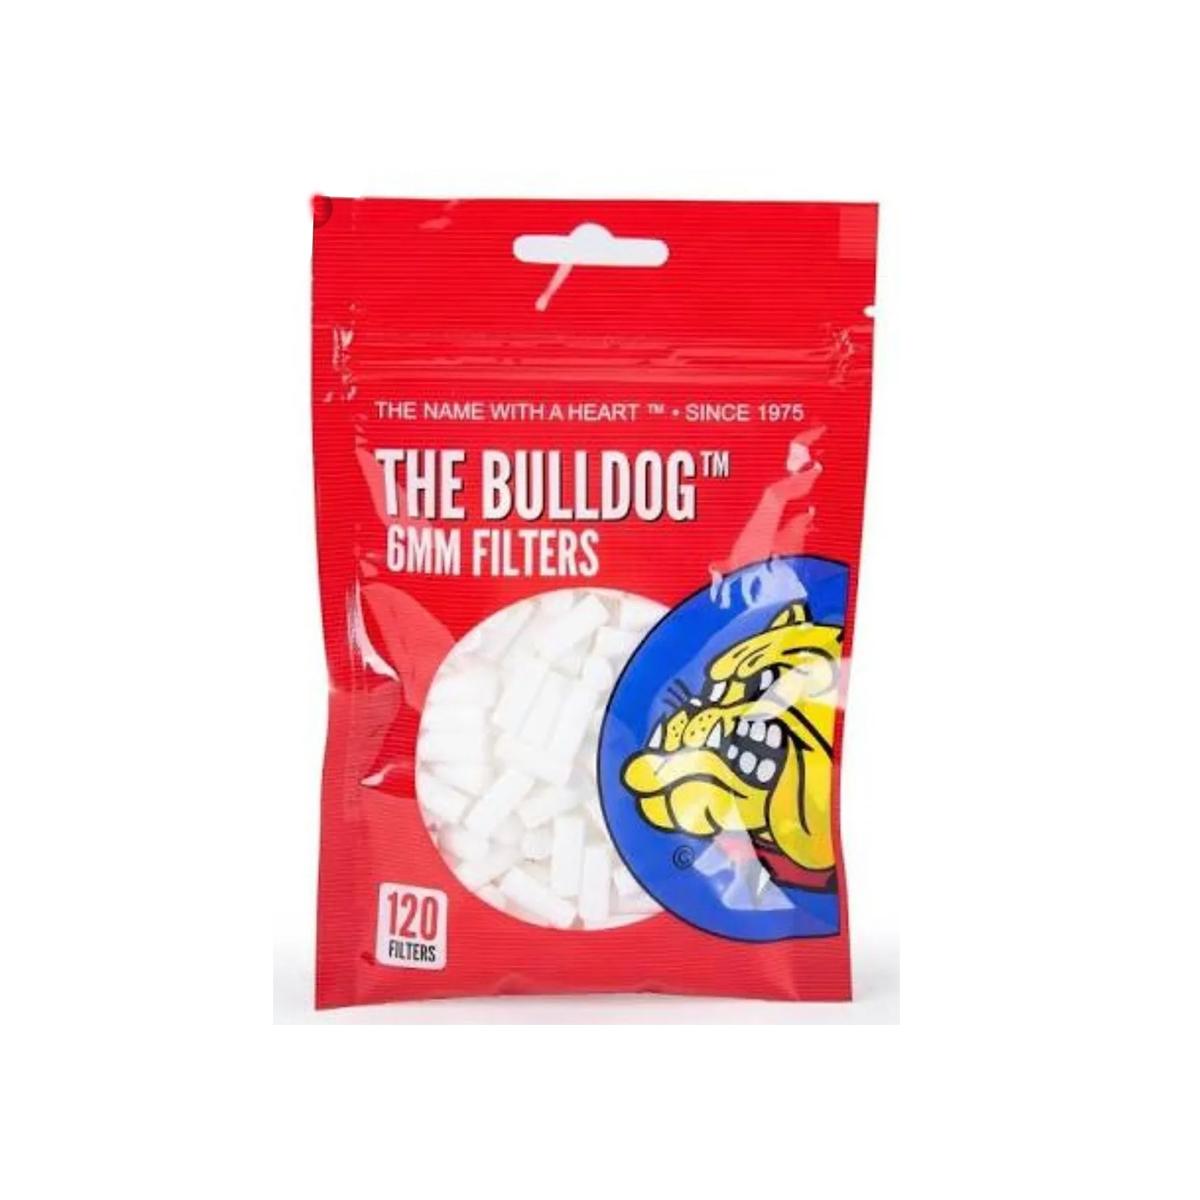 Filtro RED Bulldog Bag de 6mm com 120 unidades